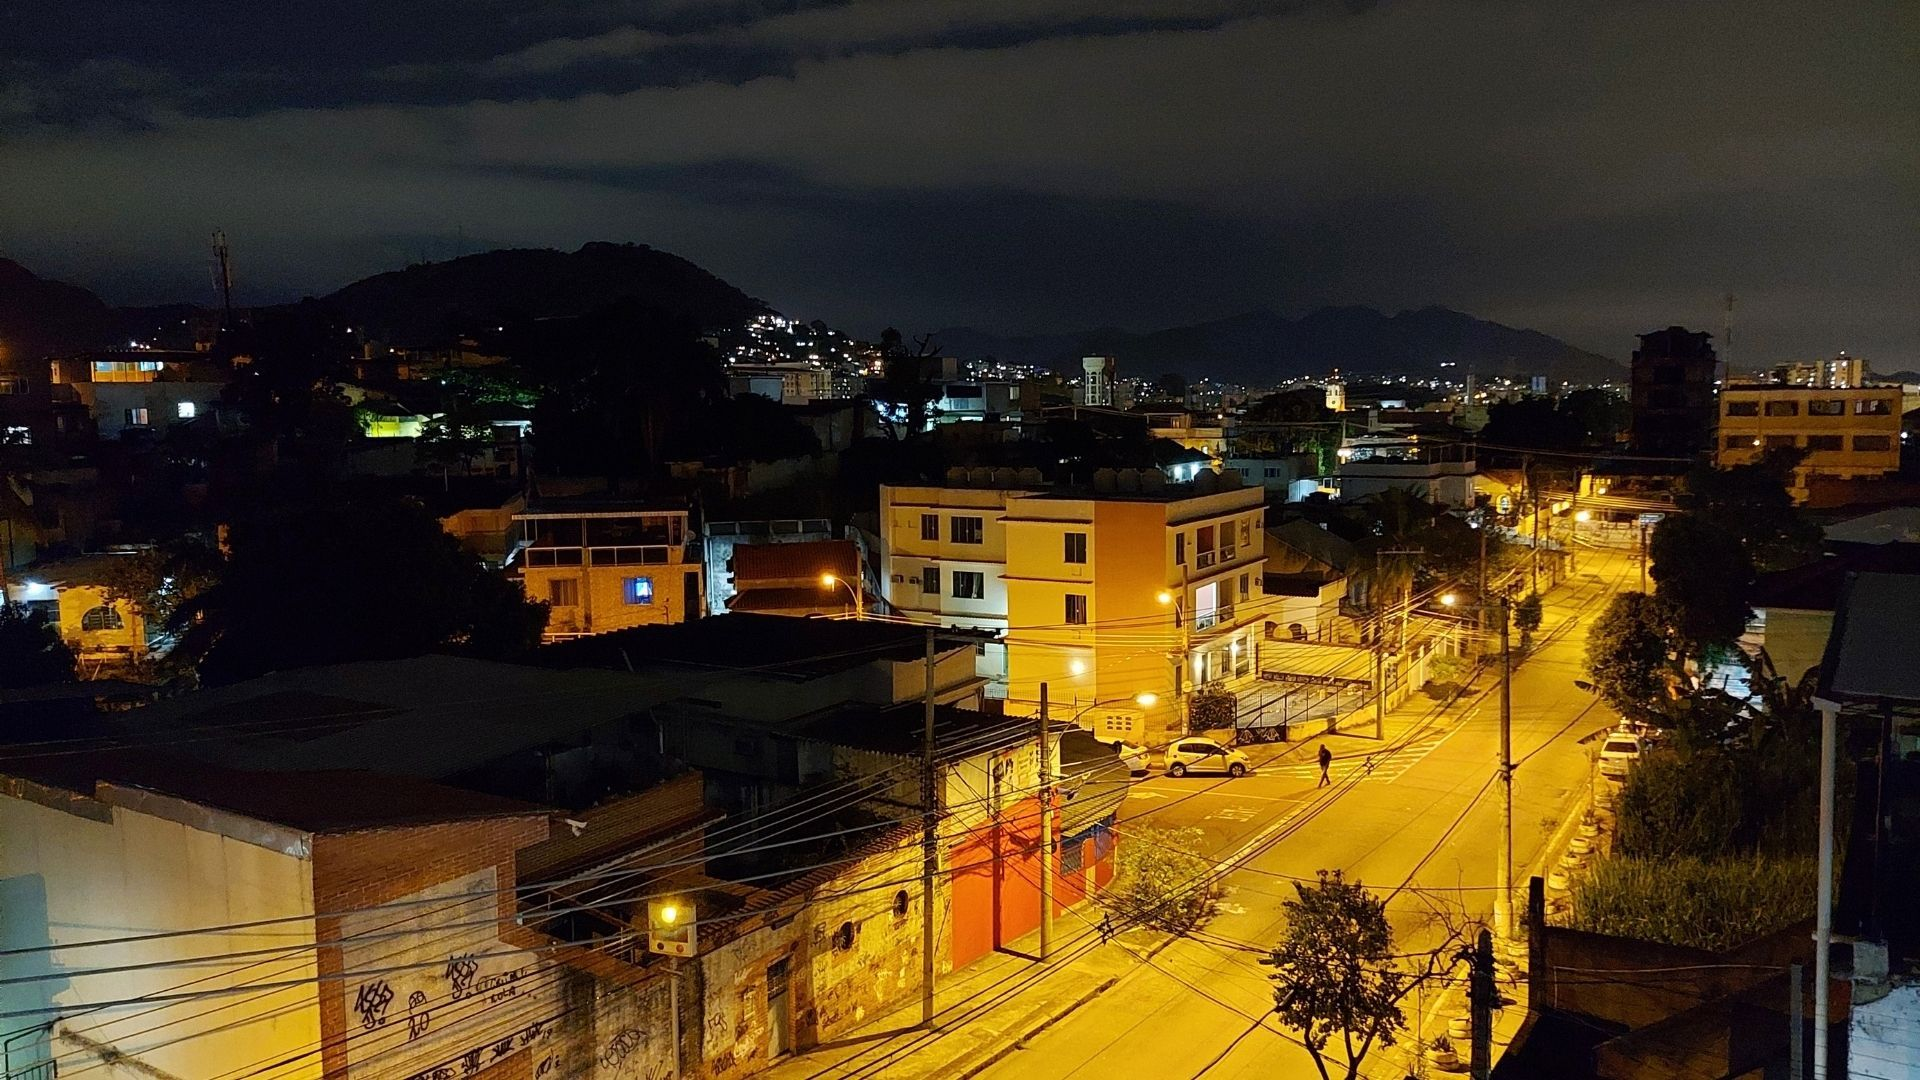 Foto noturna feita com o M51 (Foto: Aline Batista/Zoom)